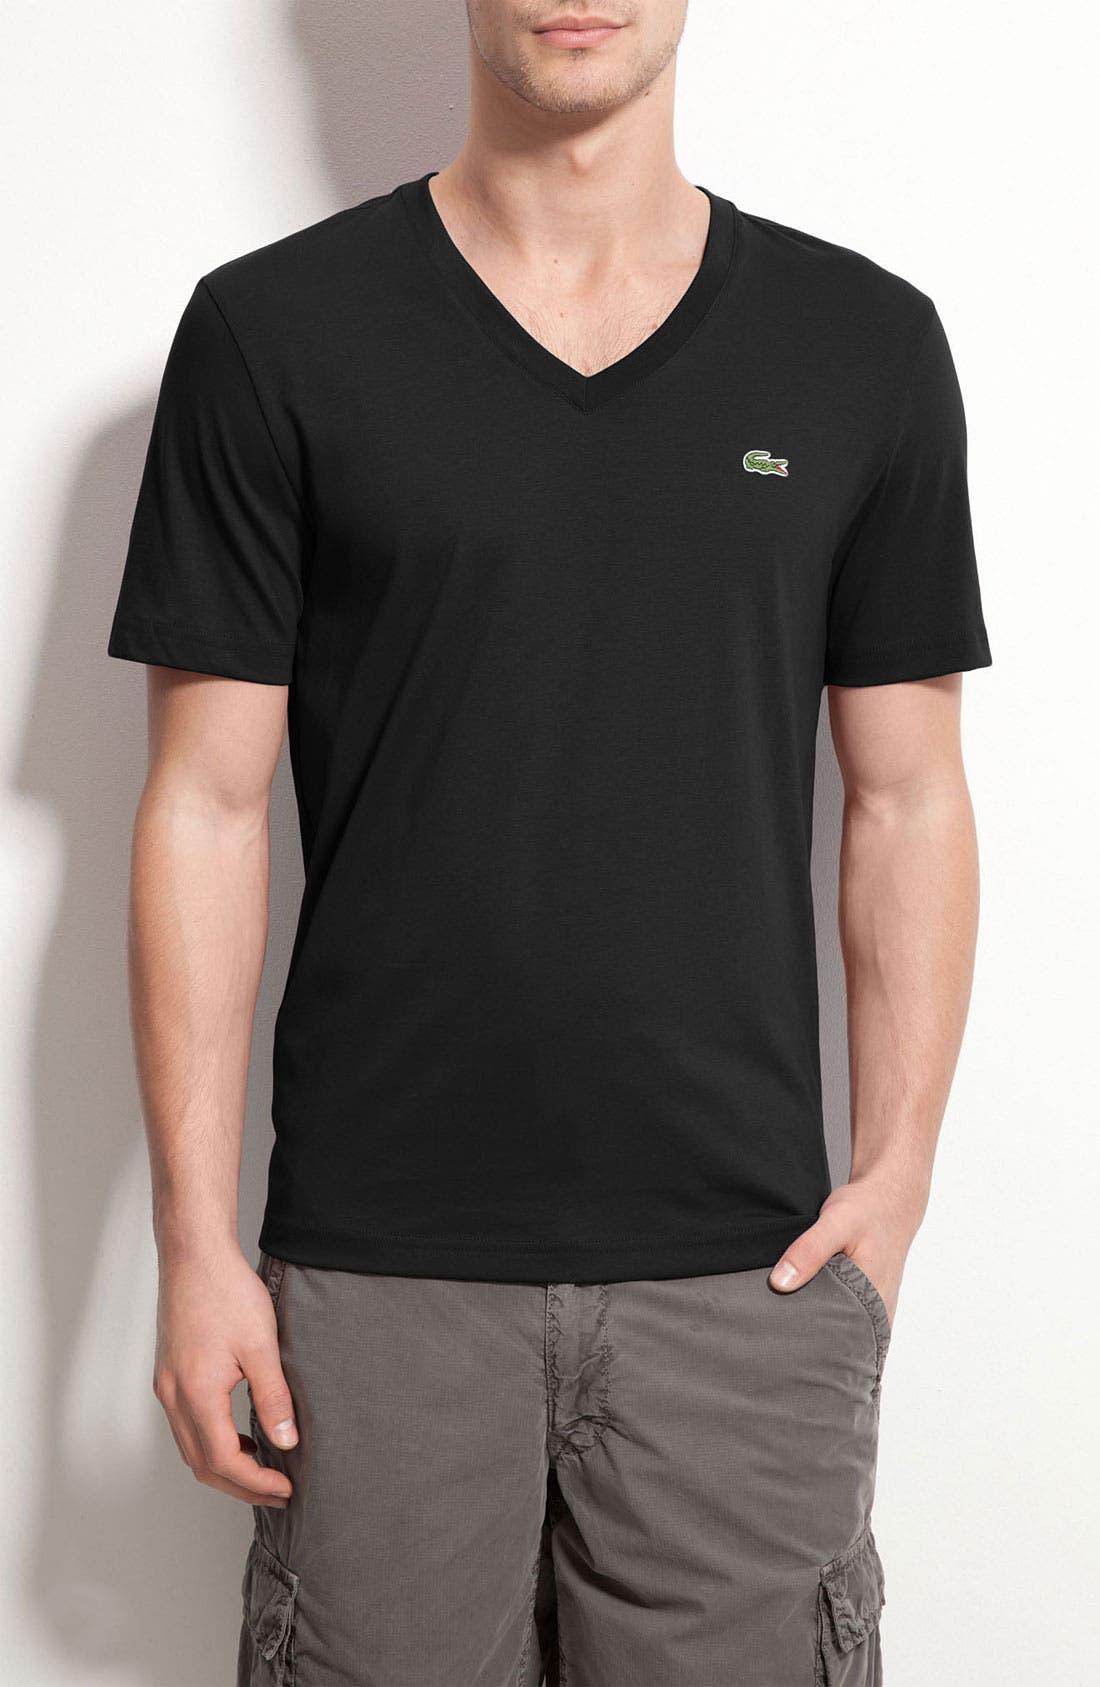 Main Image - Lacoste L!VE Trim Fit Jersey V-Neck T-Shirt